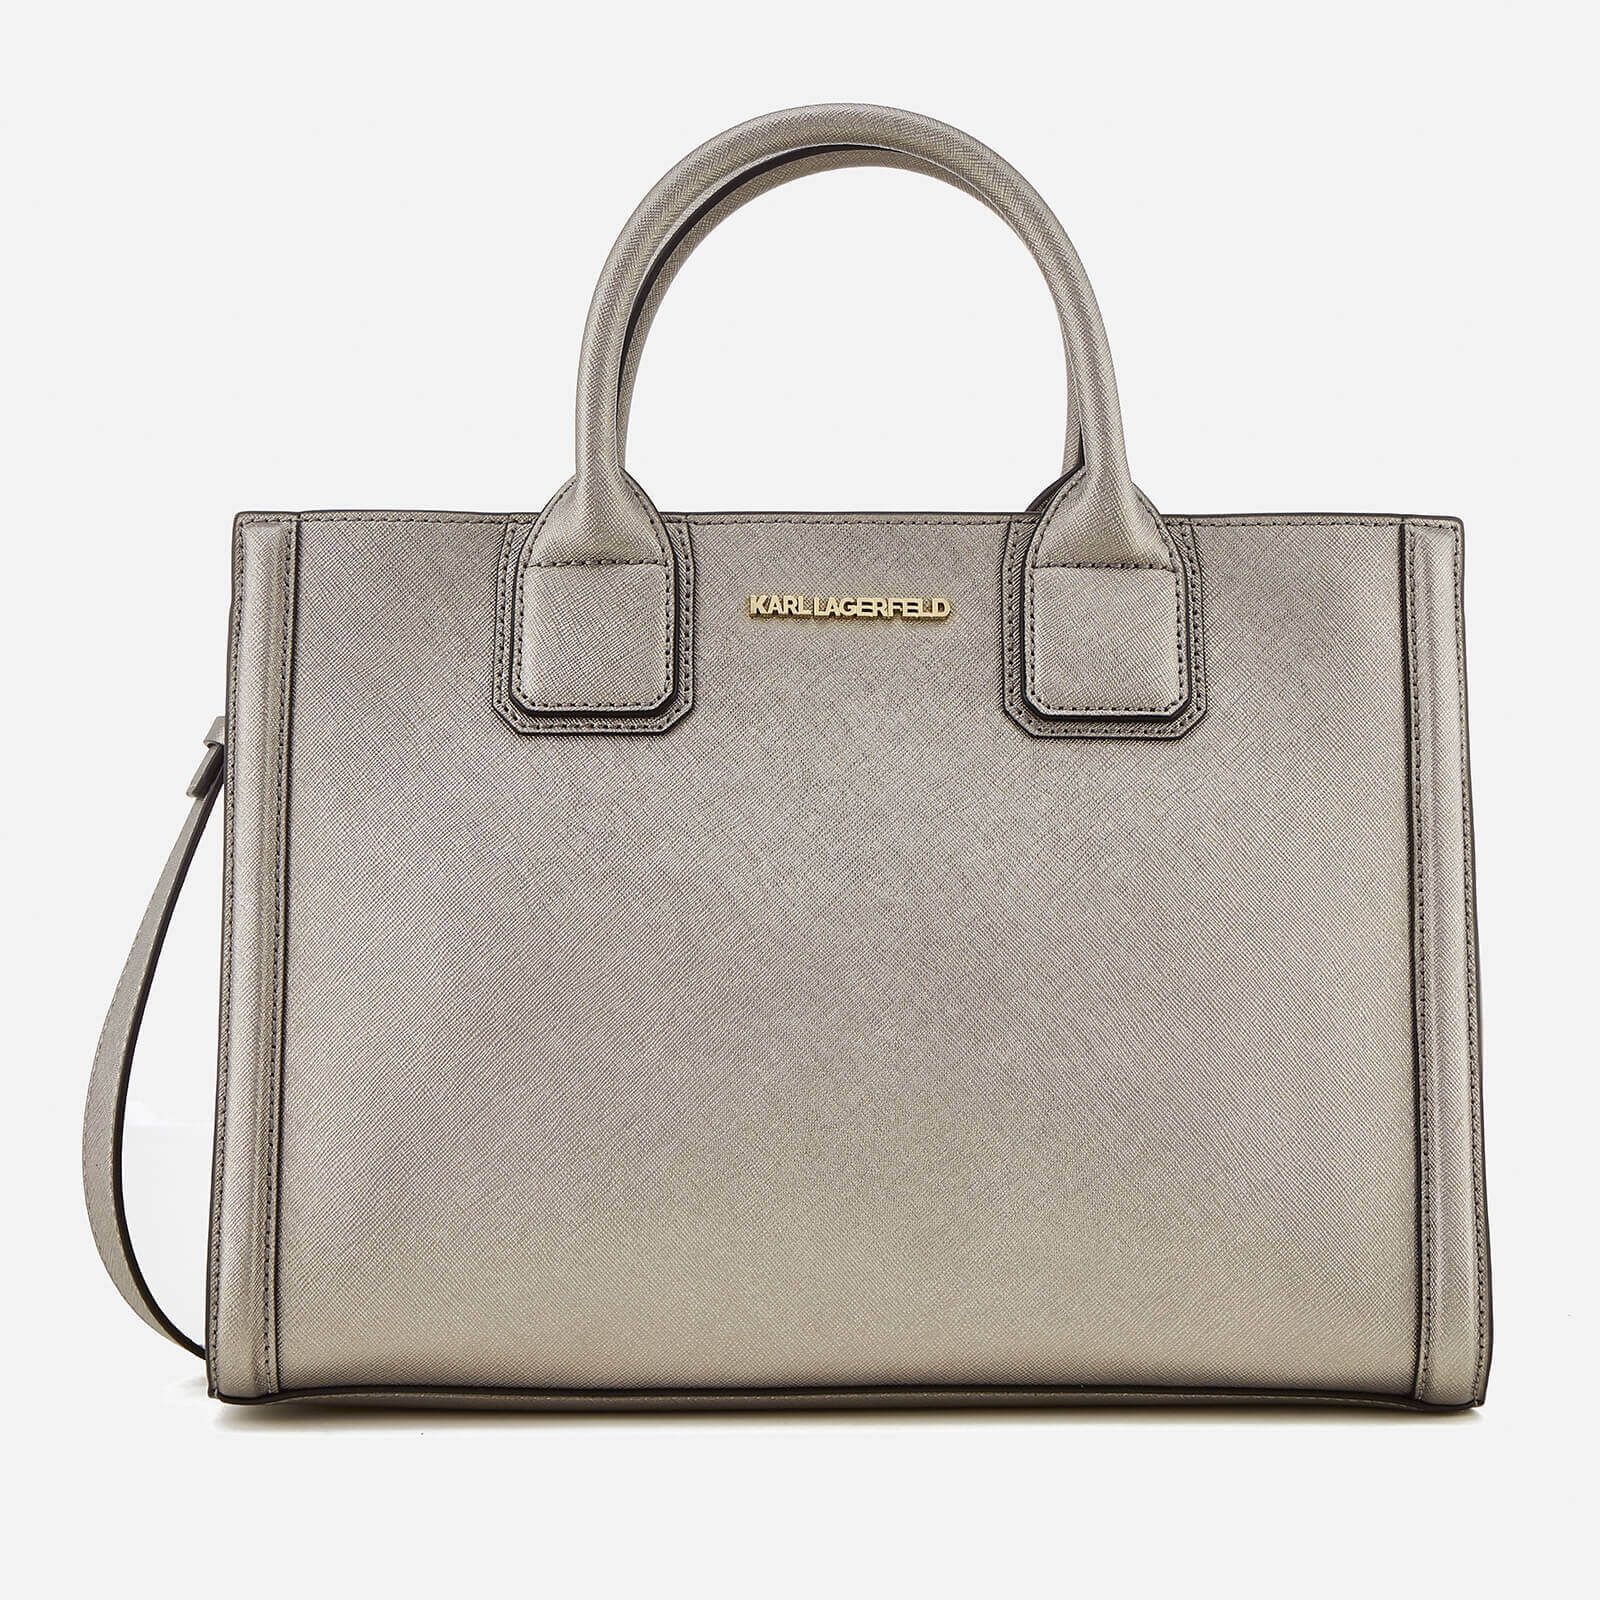 7e6d68ab86c6f Karl Lagerfeld Women s K Klassik Tote Bag - Pink Bronze - Free UK ...